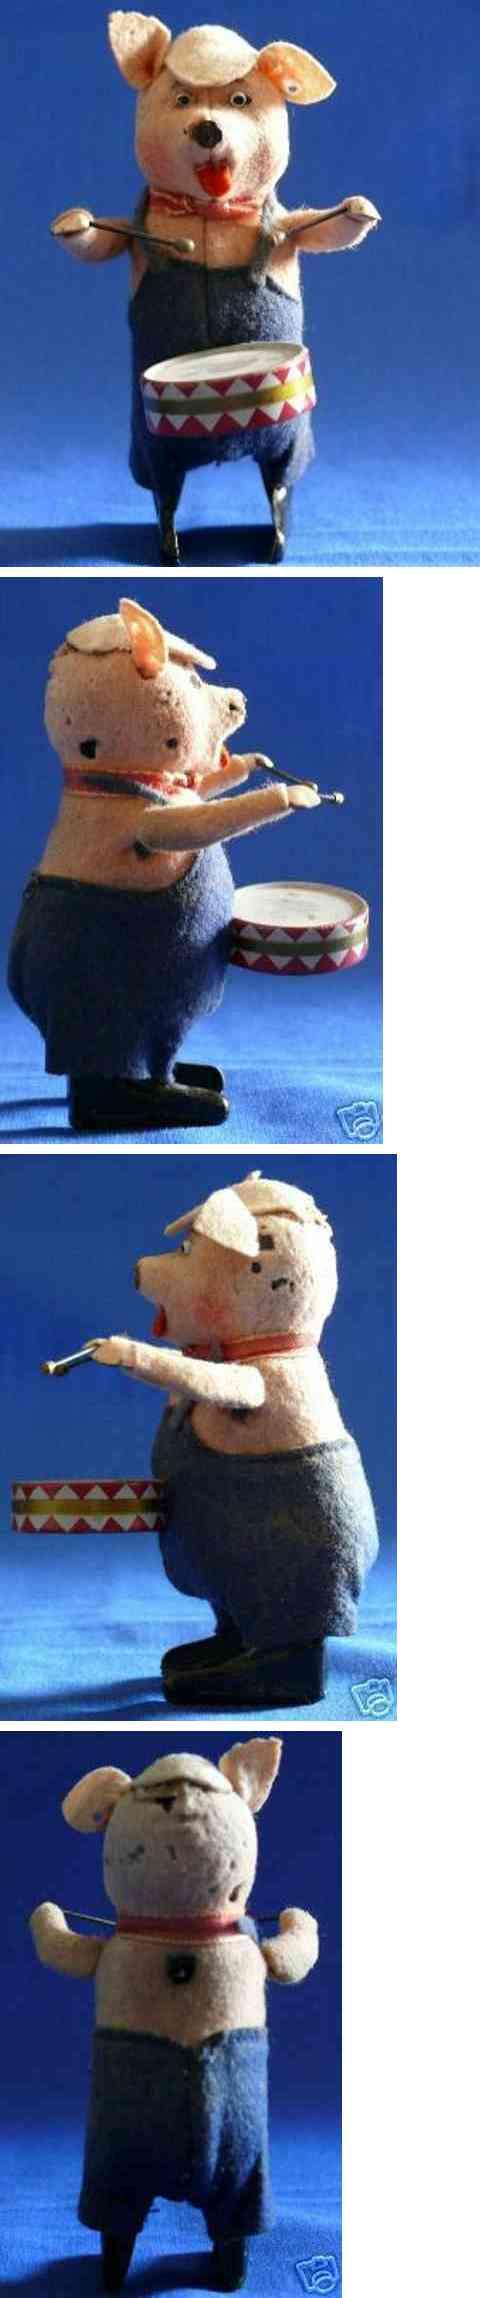 schuco 980/1 tin dance figure pig with drum